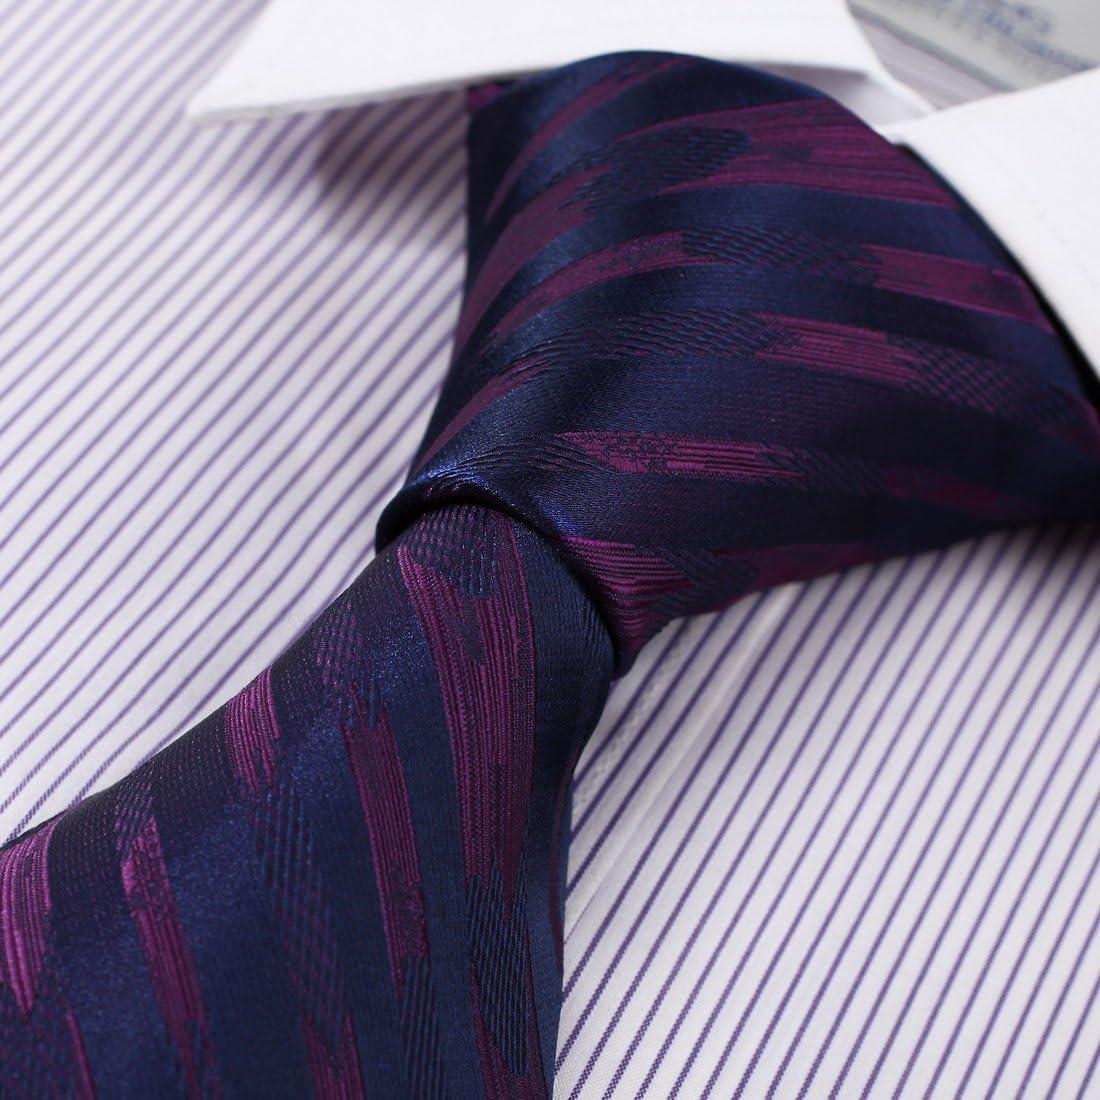 DAA7A03B Grey Black Stripes Romance Gift Tie Woven Microfiber Italy Polyster Neckwear By Dan Smith